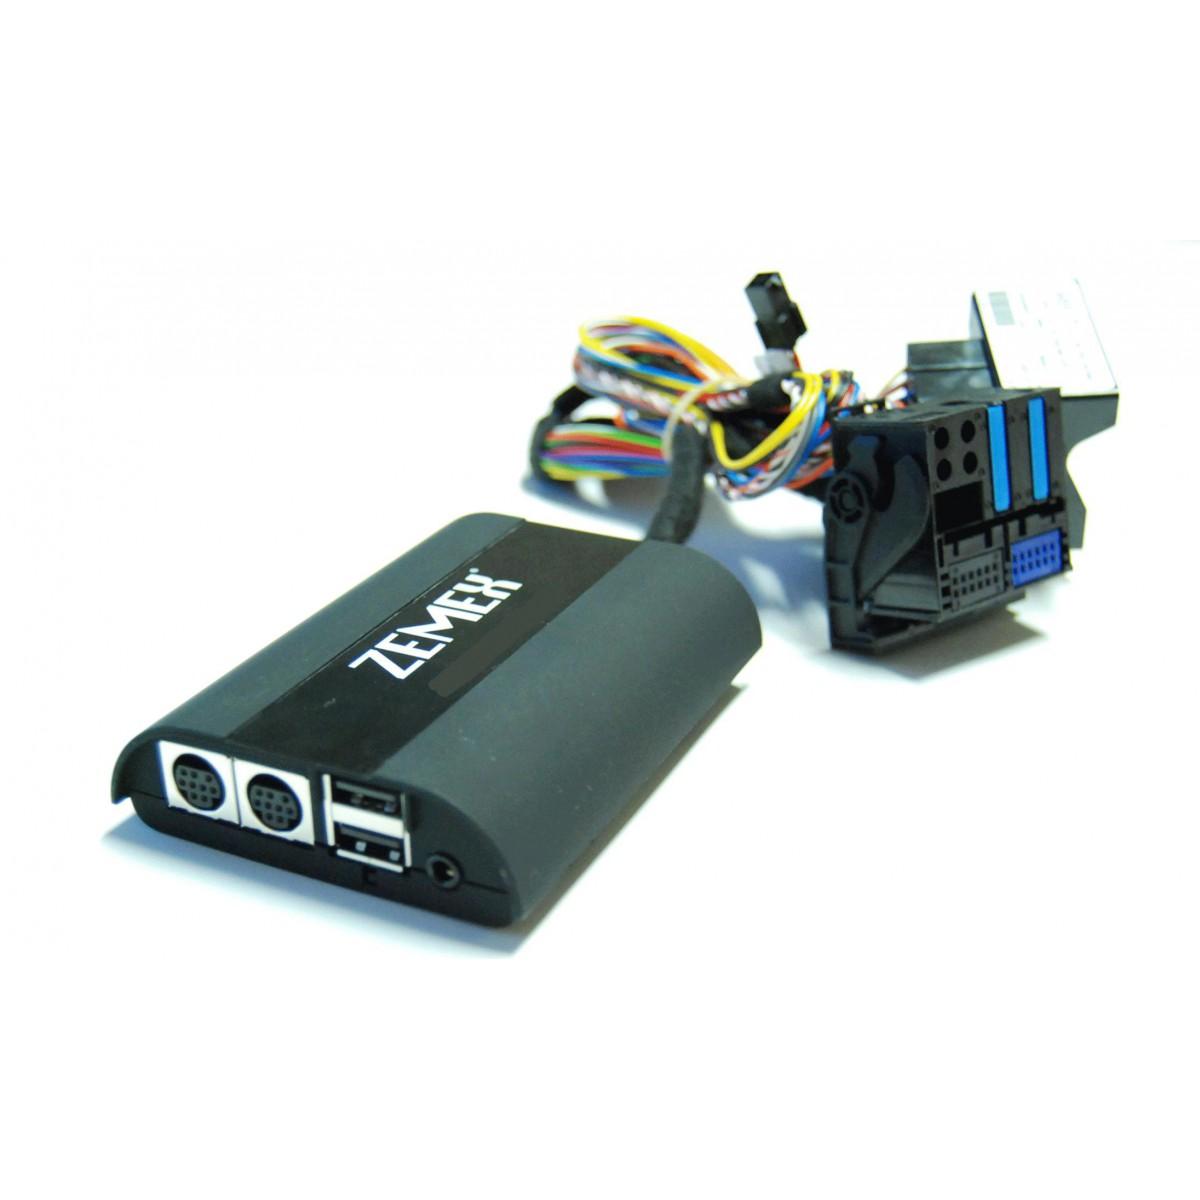 Handy Freisprechanlage Bluetooth Seat Rcd 310 510 Rns 310 510 Zemex Autoelektronik